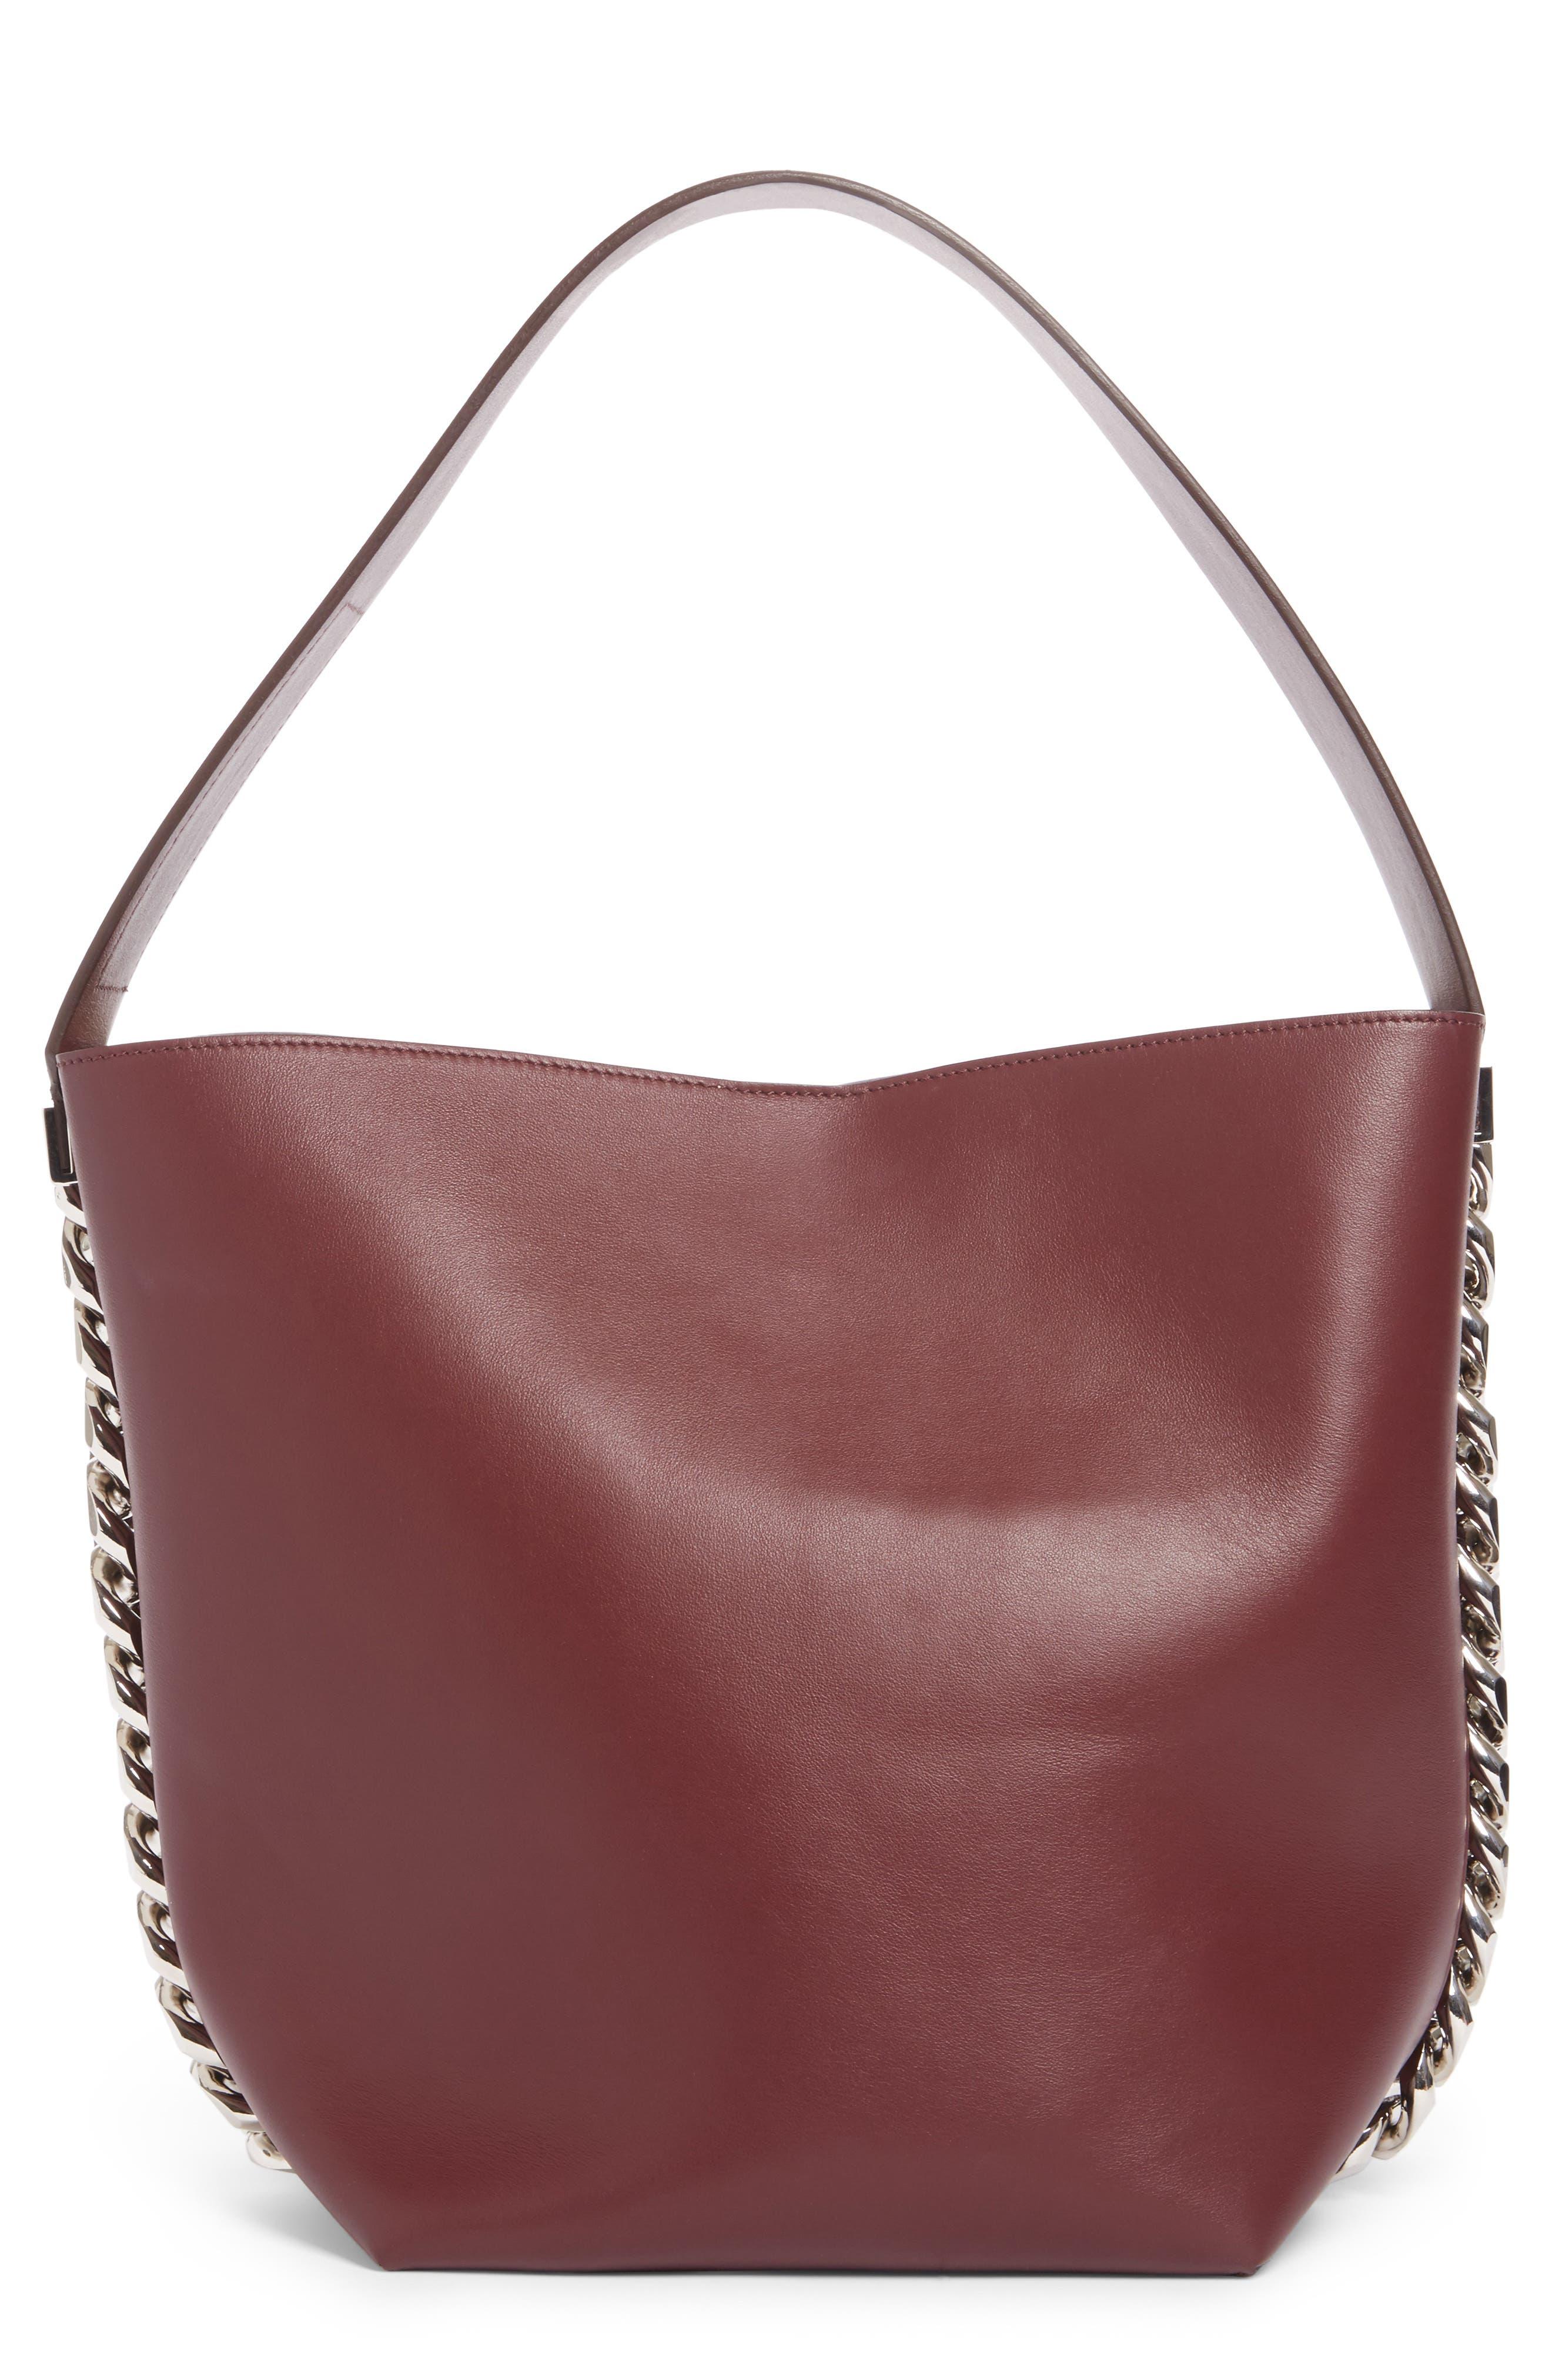 Givenchy Infinity Calfskin Leather Bucket Bag